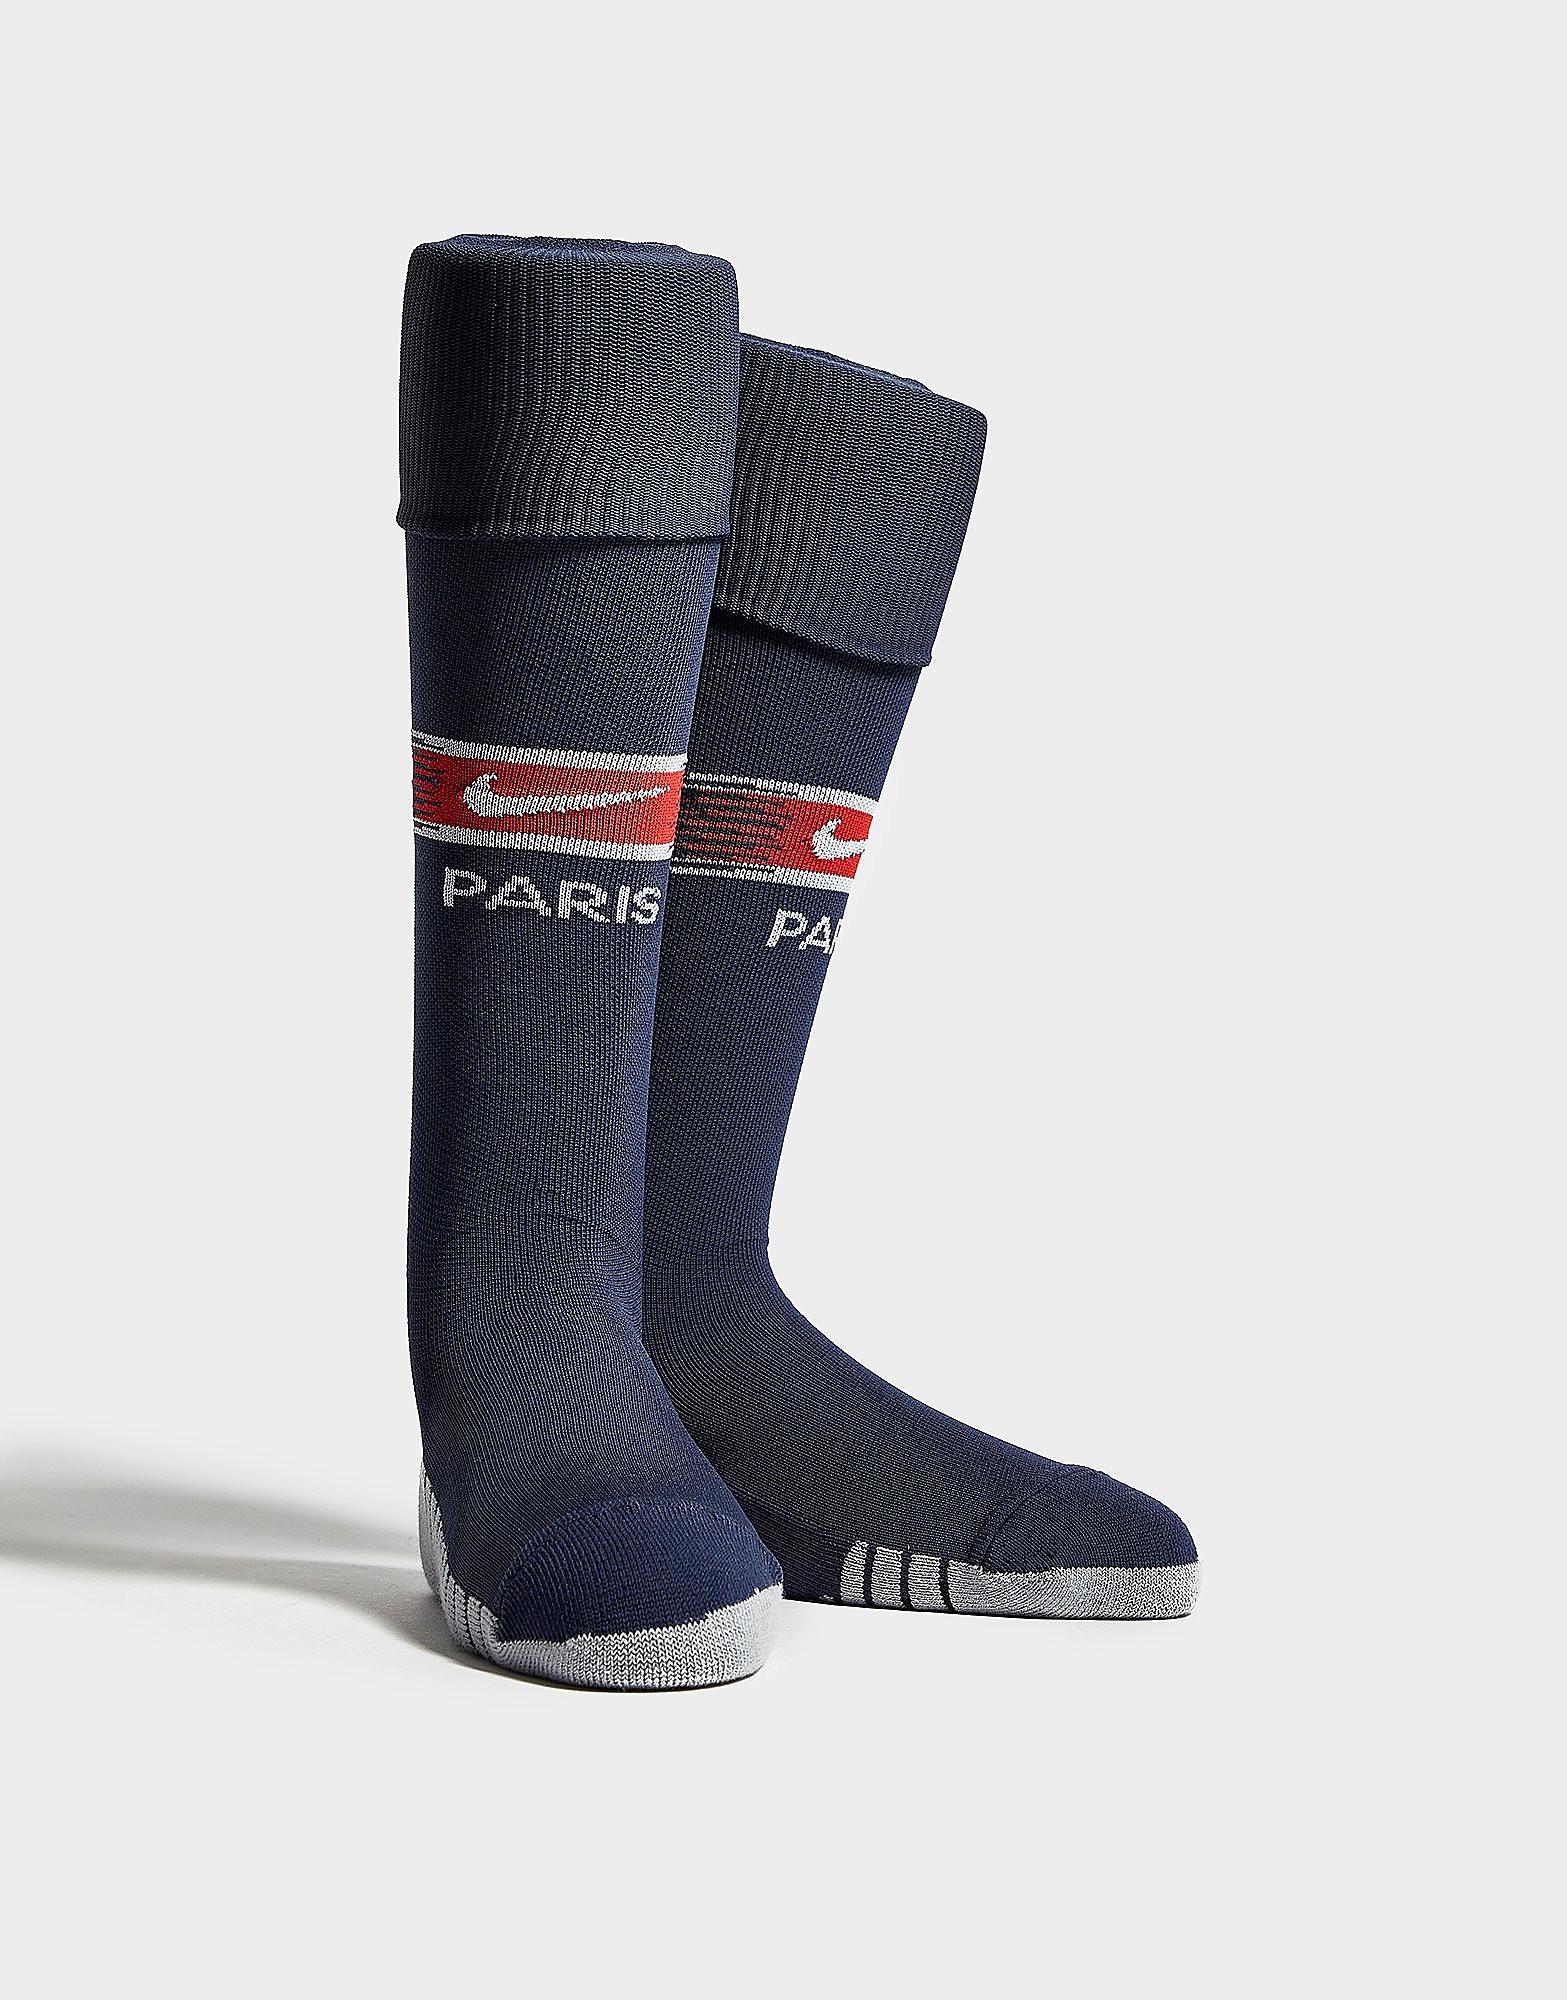 Nike Paris Saint Germain 2018/19 Home Socks Junior